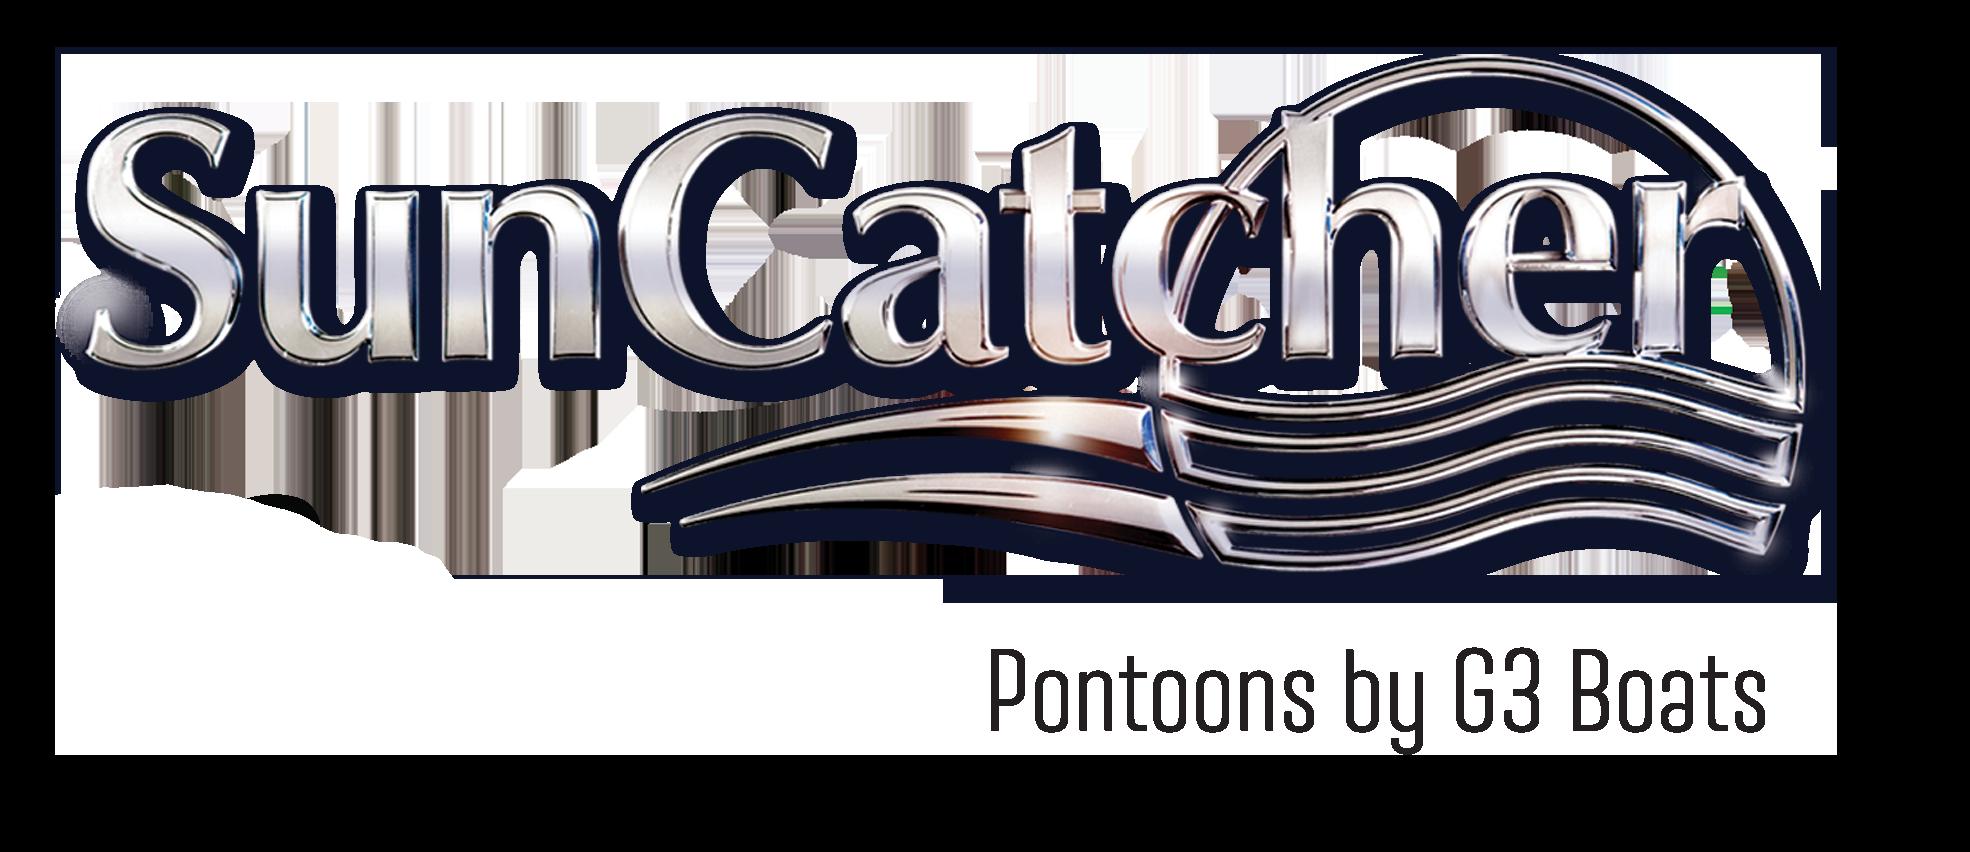 SunCatcher Pontoons